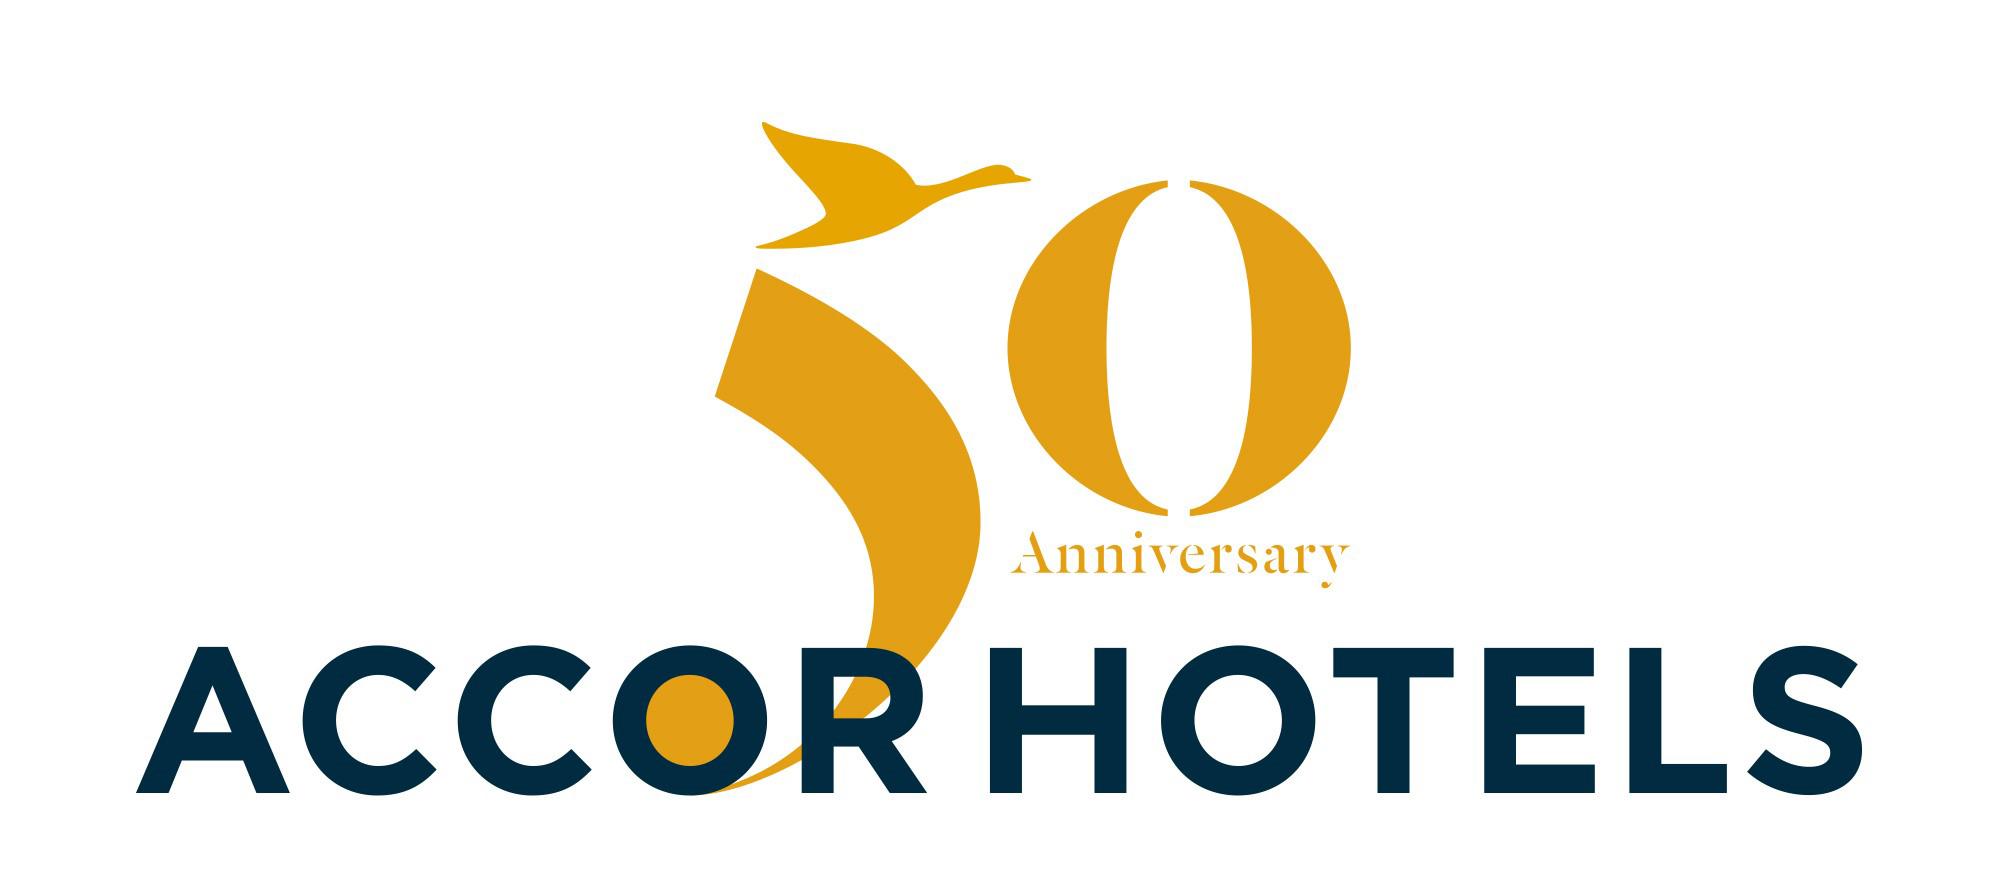 accorhotels celebrates its 50th anniversary accorhotels rh press accorhotels group 50th anniversary logos 50 years 50th anniversary logos vector